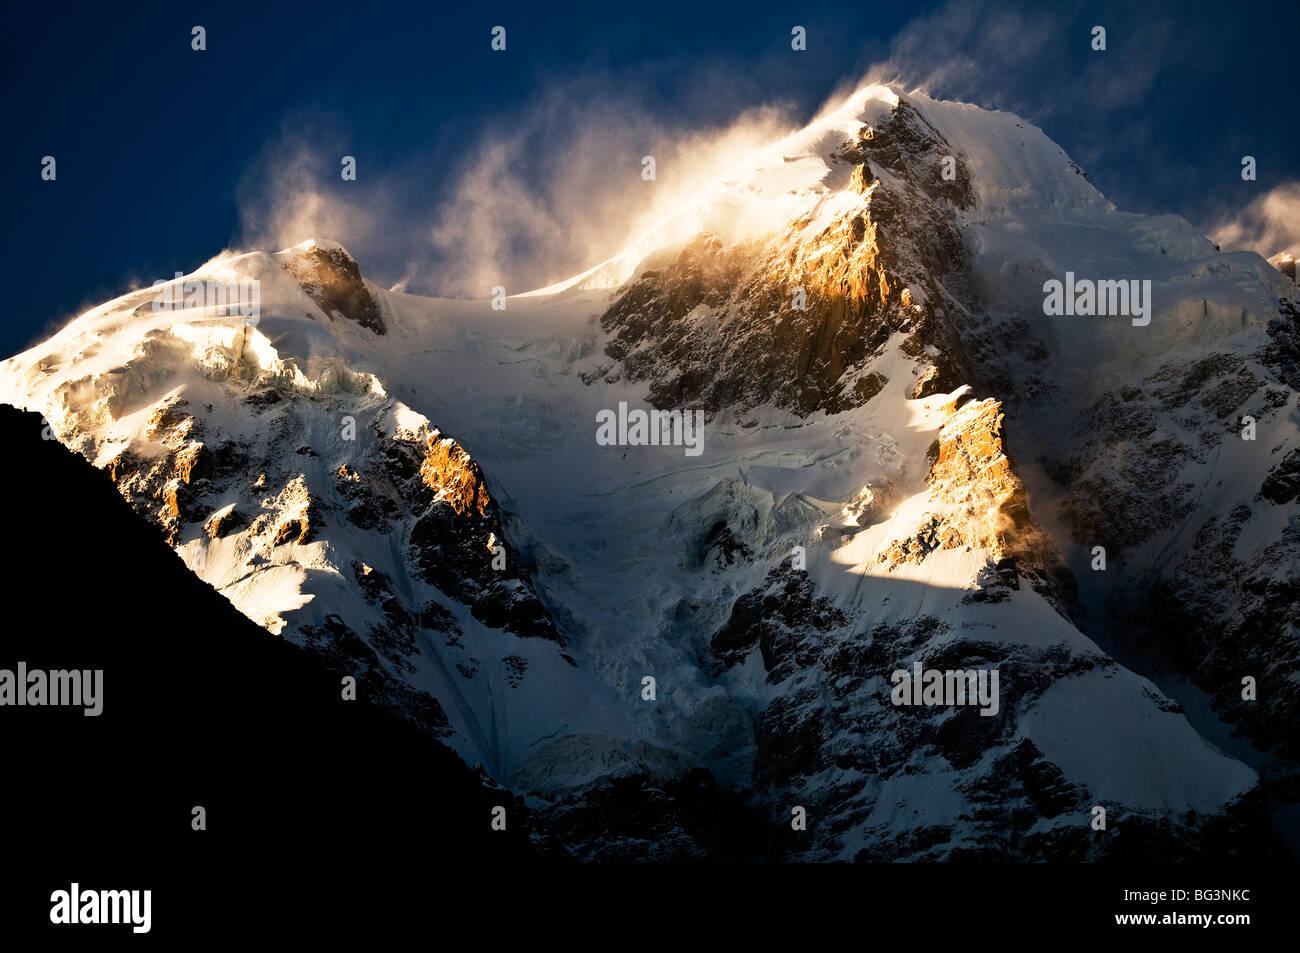 Ultar peak, Karakoram range, Hunza valley, Pakistan. - Stock Image